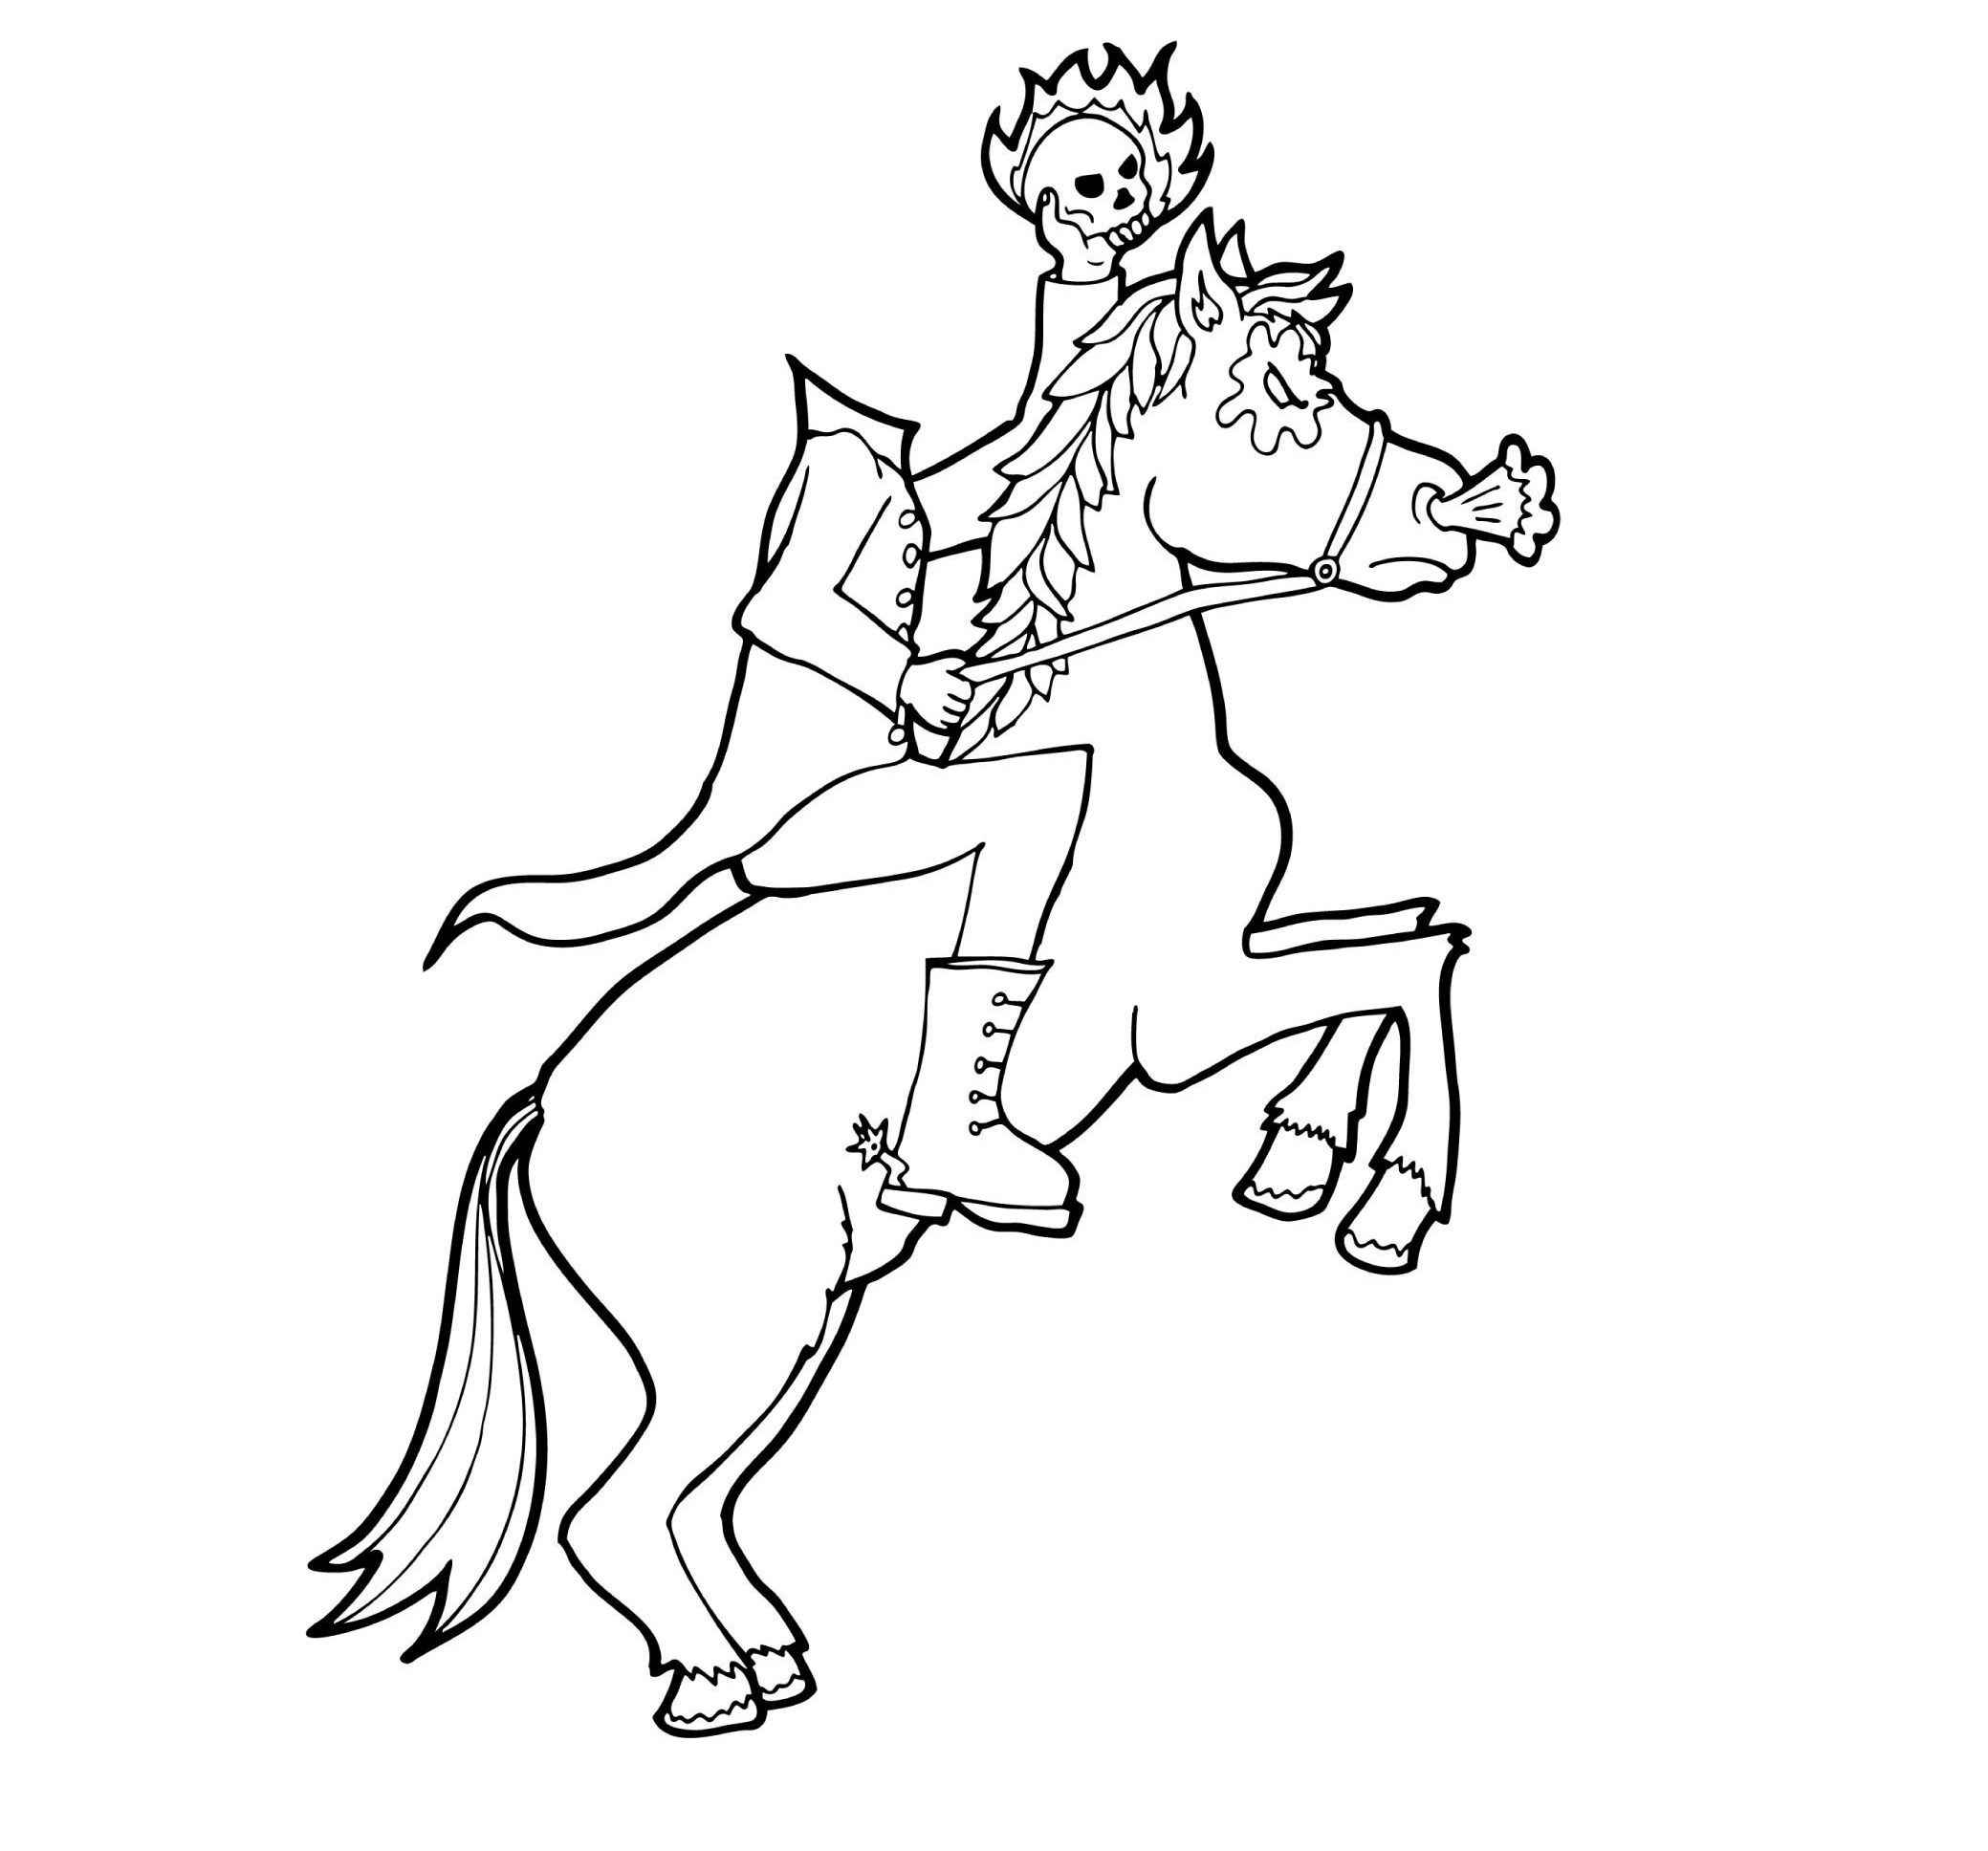 2079x1936 headless horseman coloring book sleepy hollow headless horseman - Headless Horseman Coloring Page